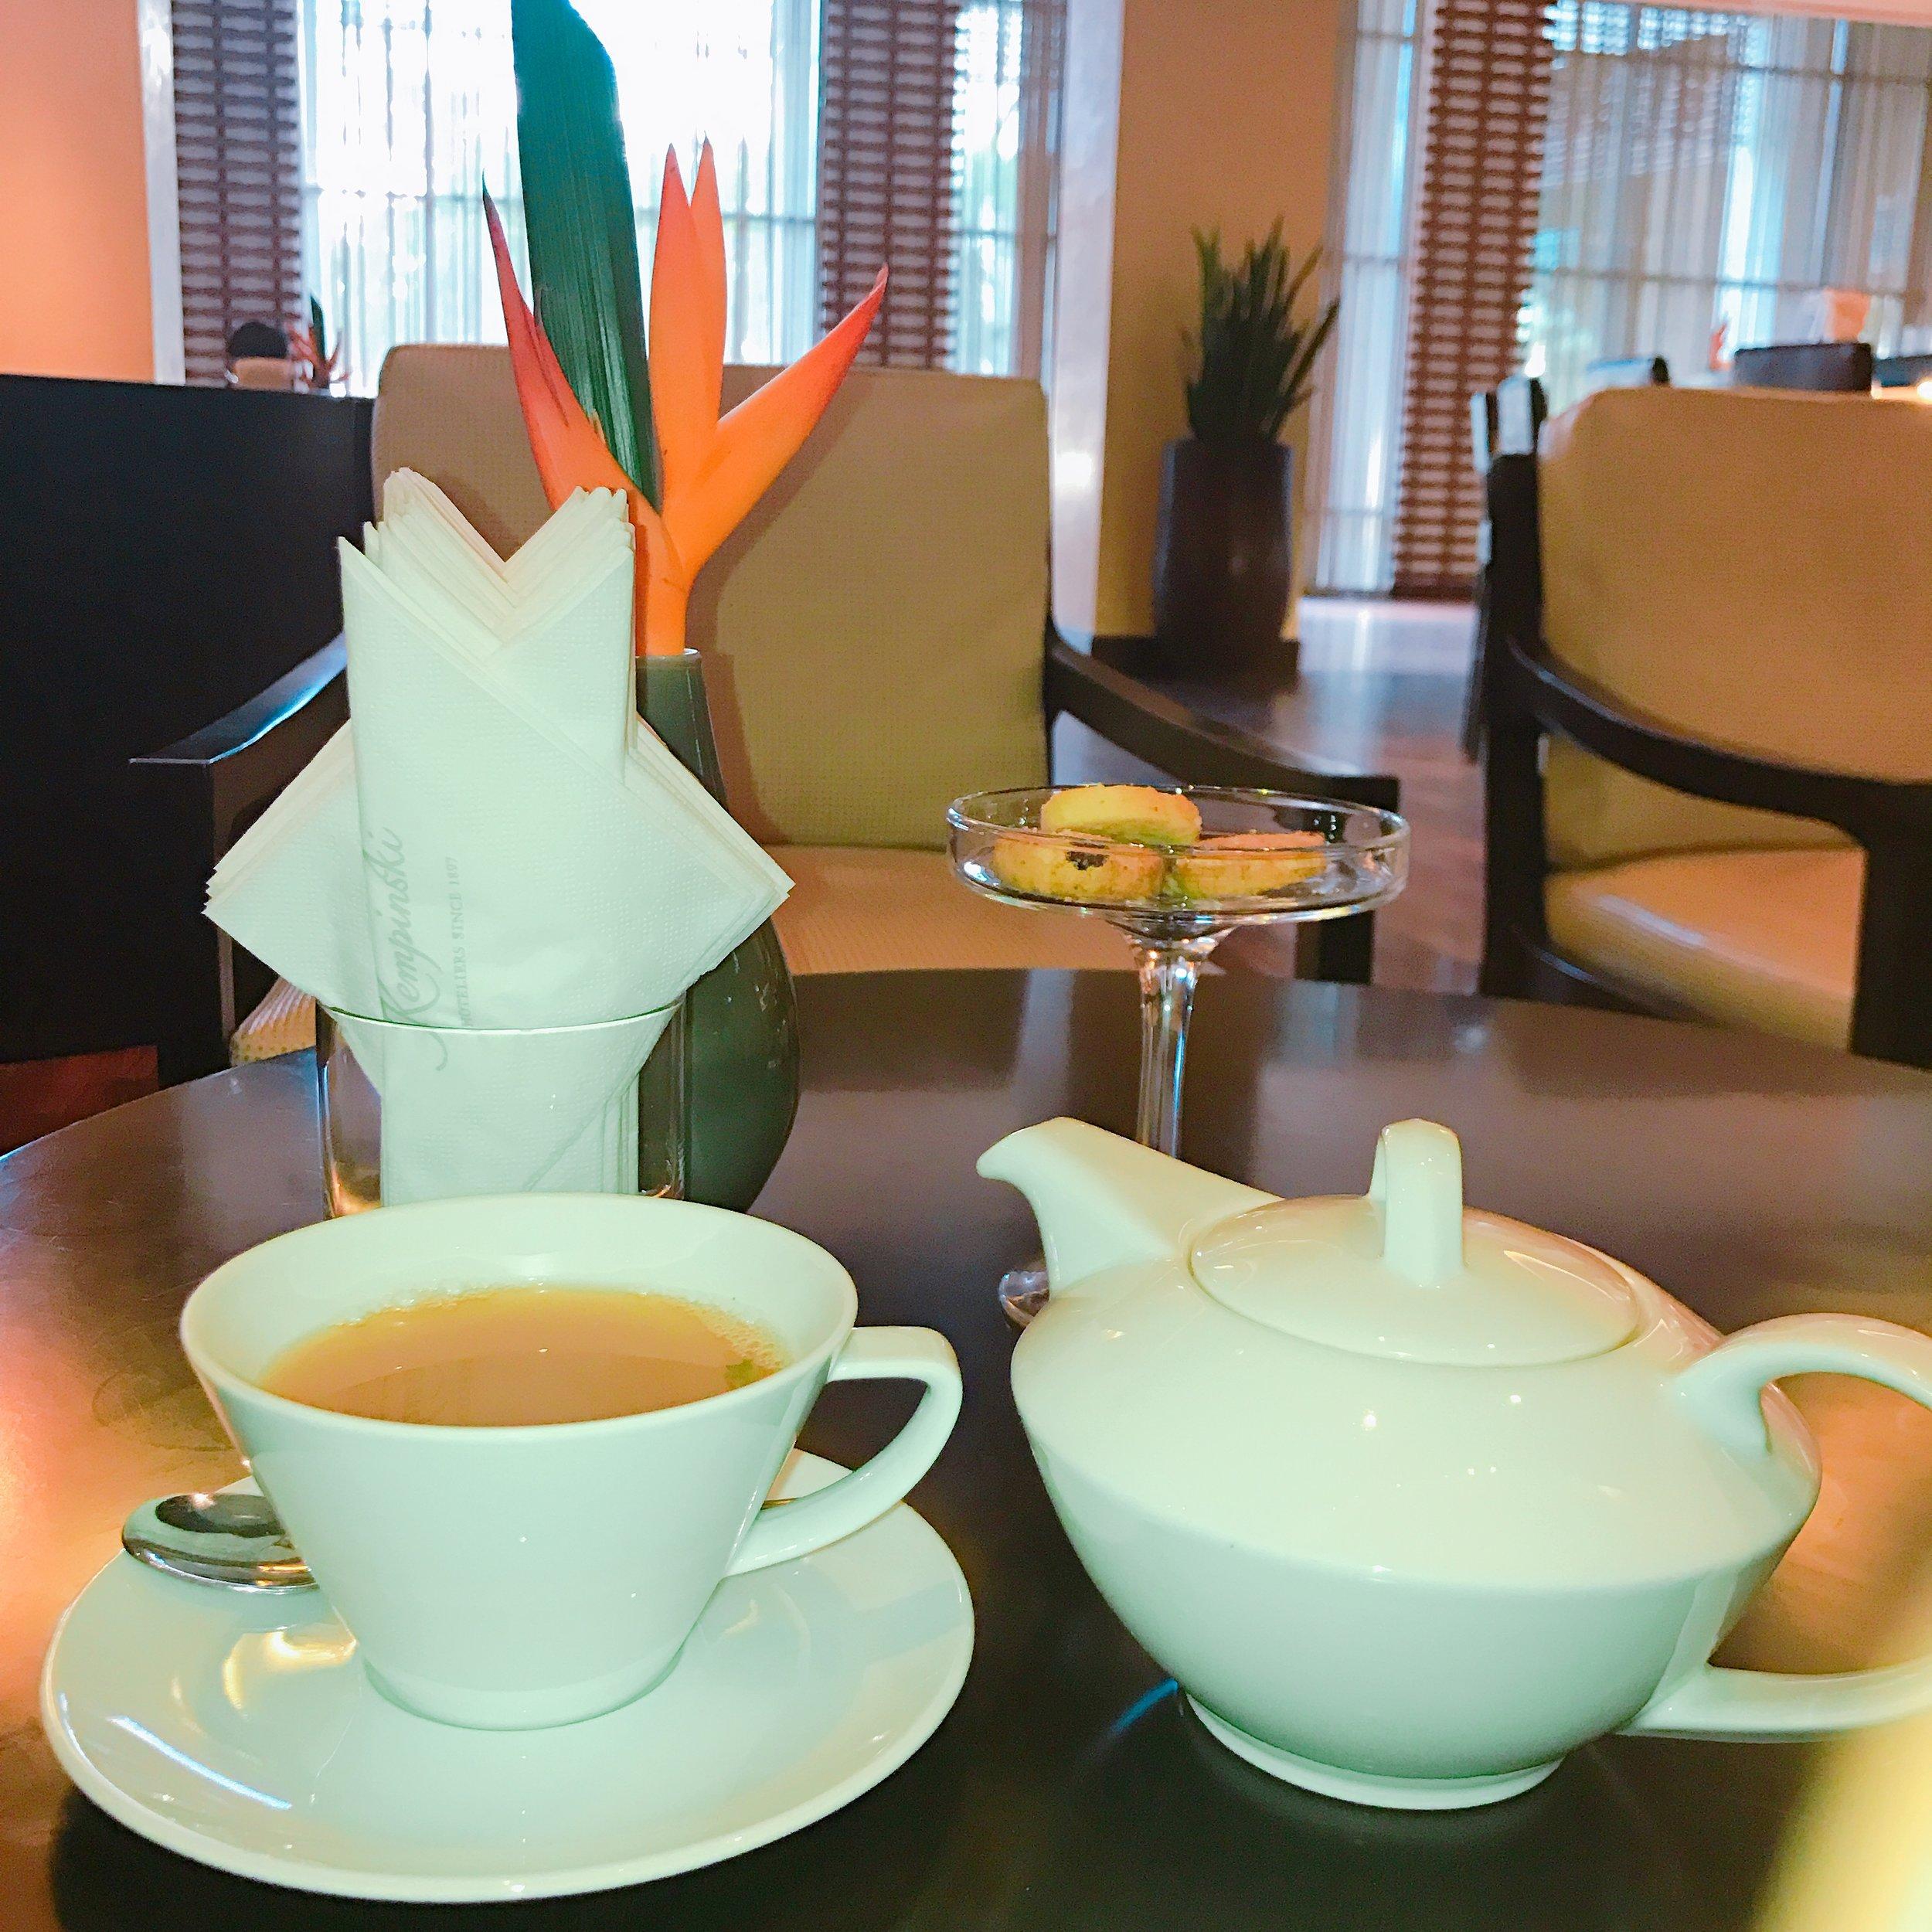 Kempinski-Goldcoast-Accra-Hotel-Review-Photos-vickieremoeofficial31.JPG